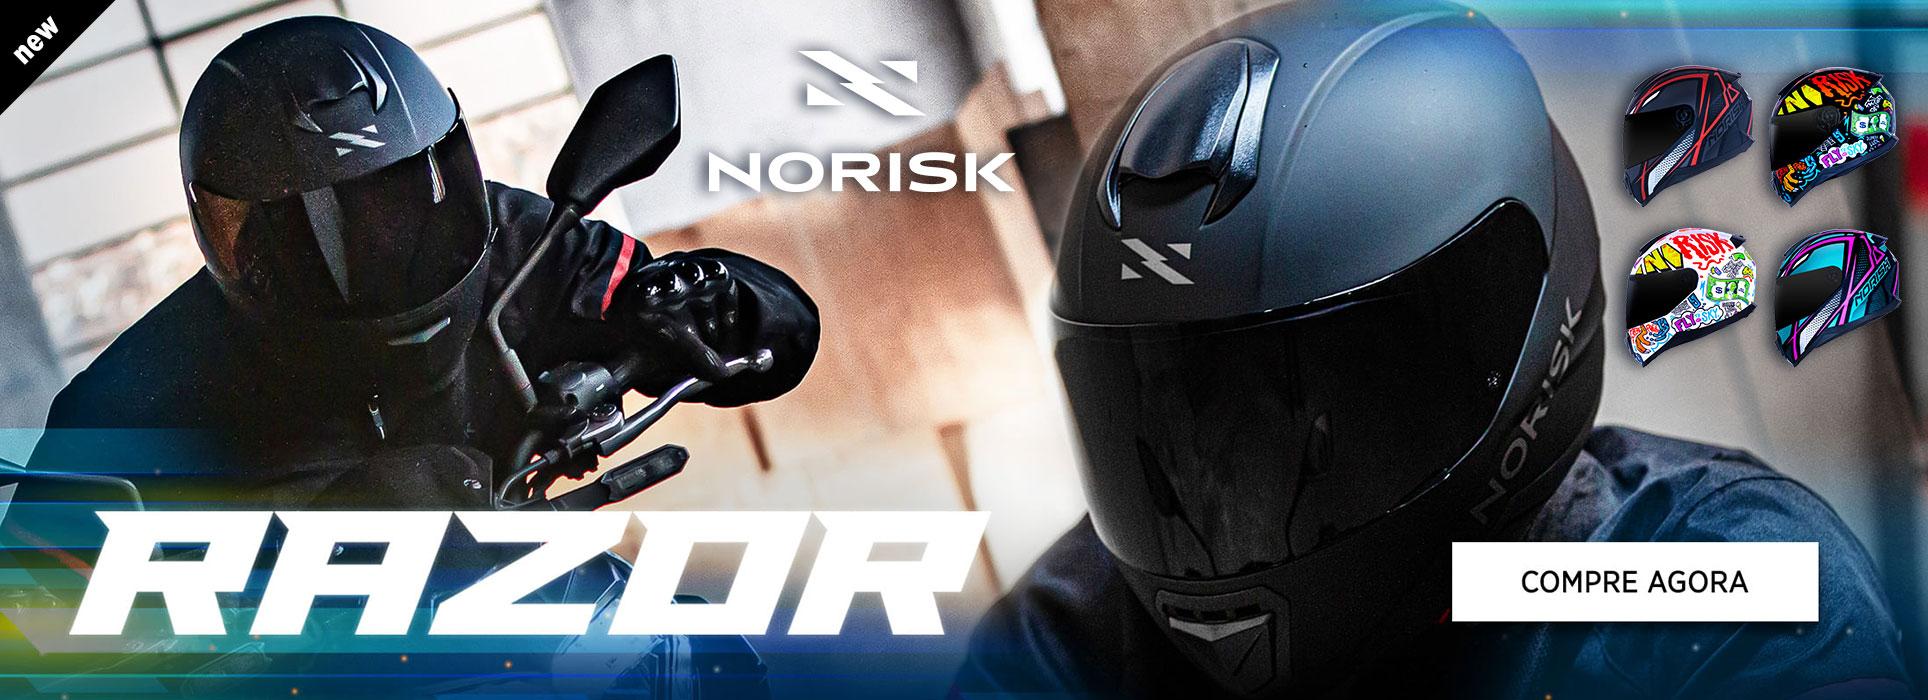 norisk-razor